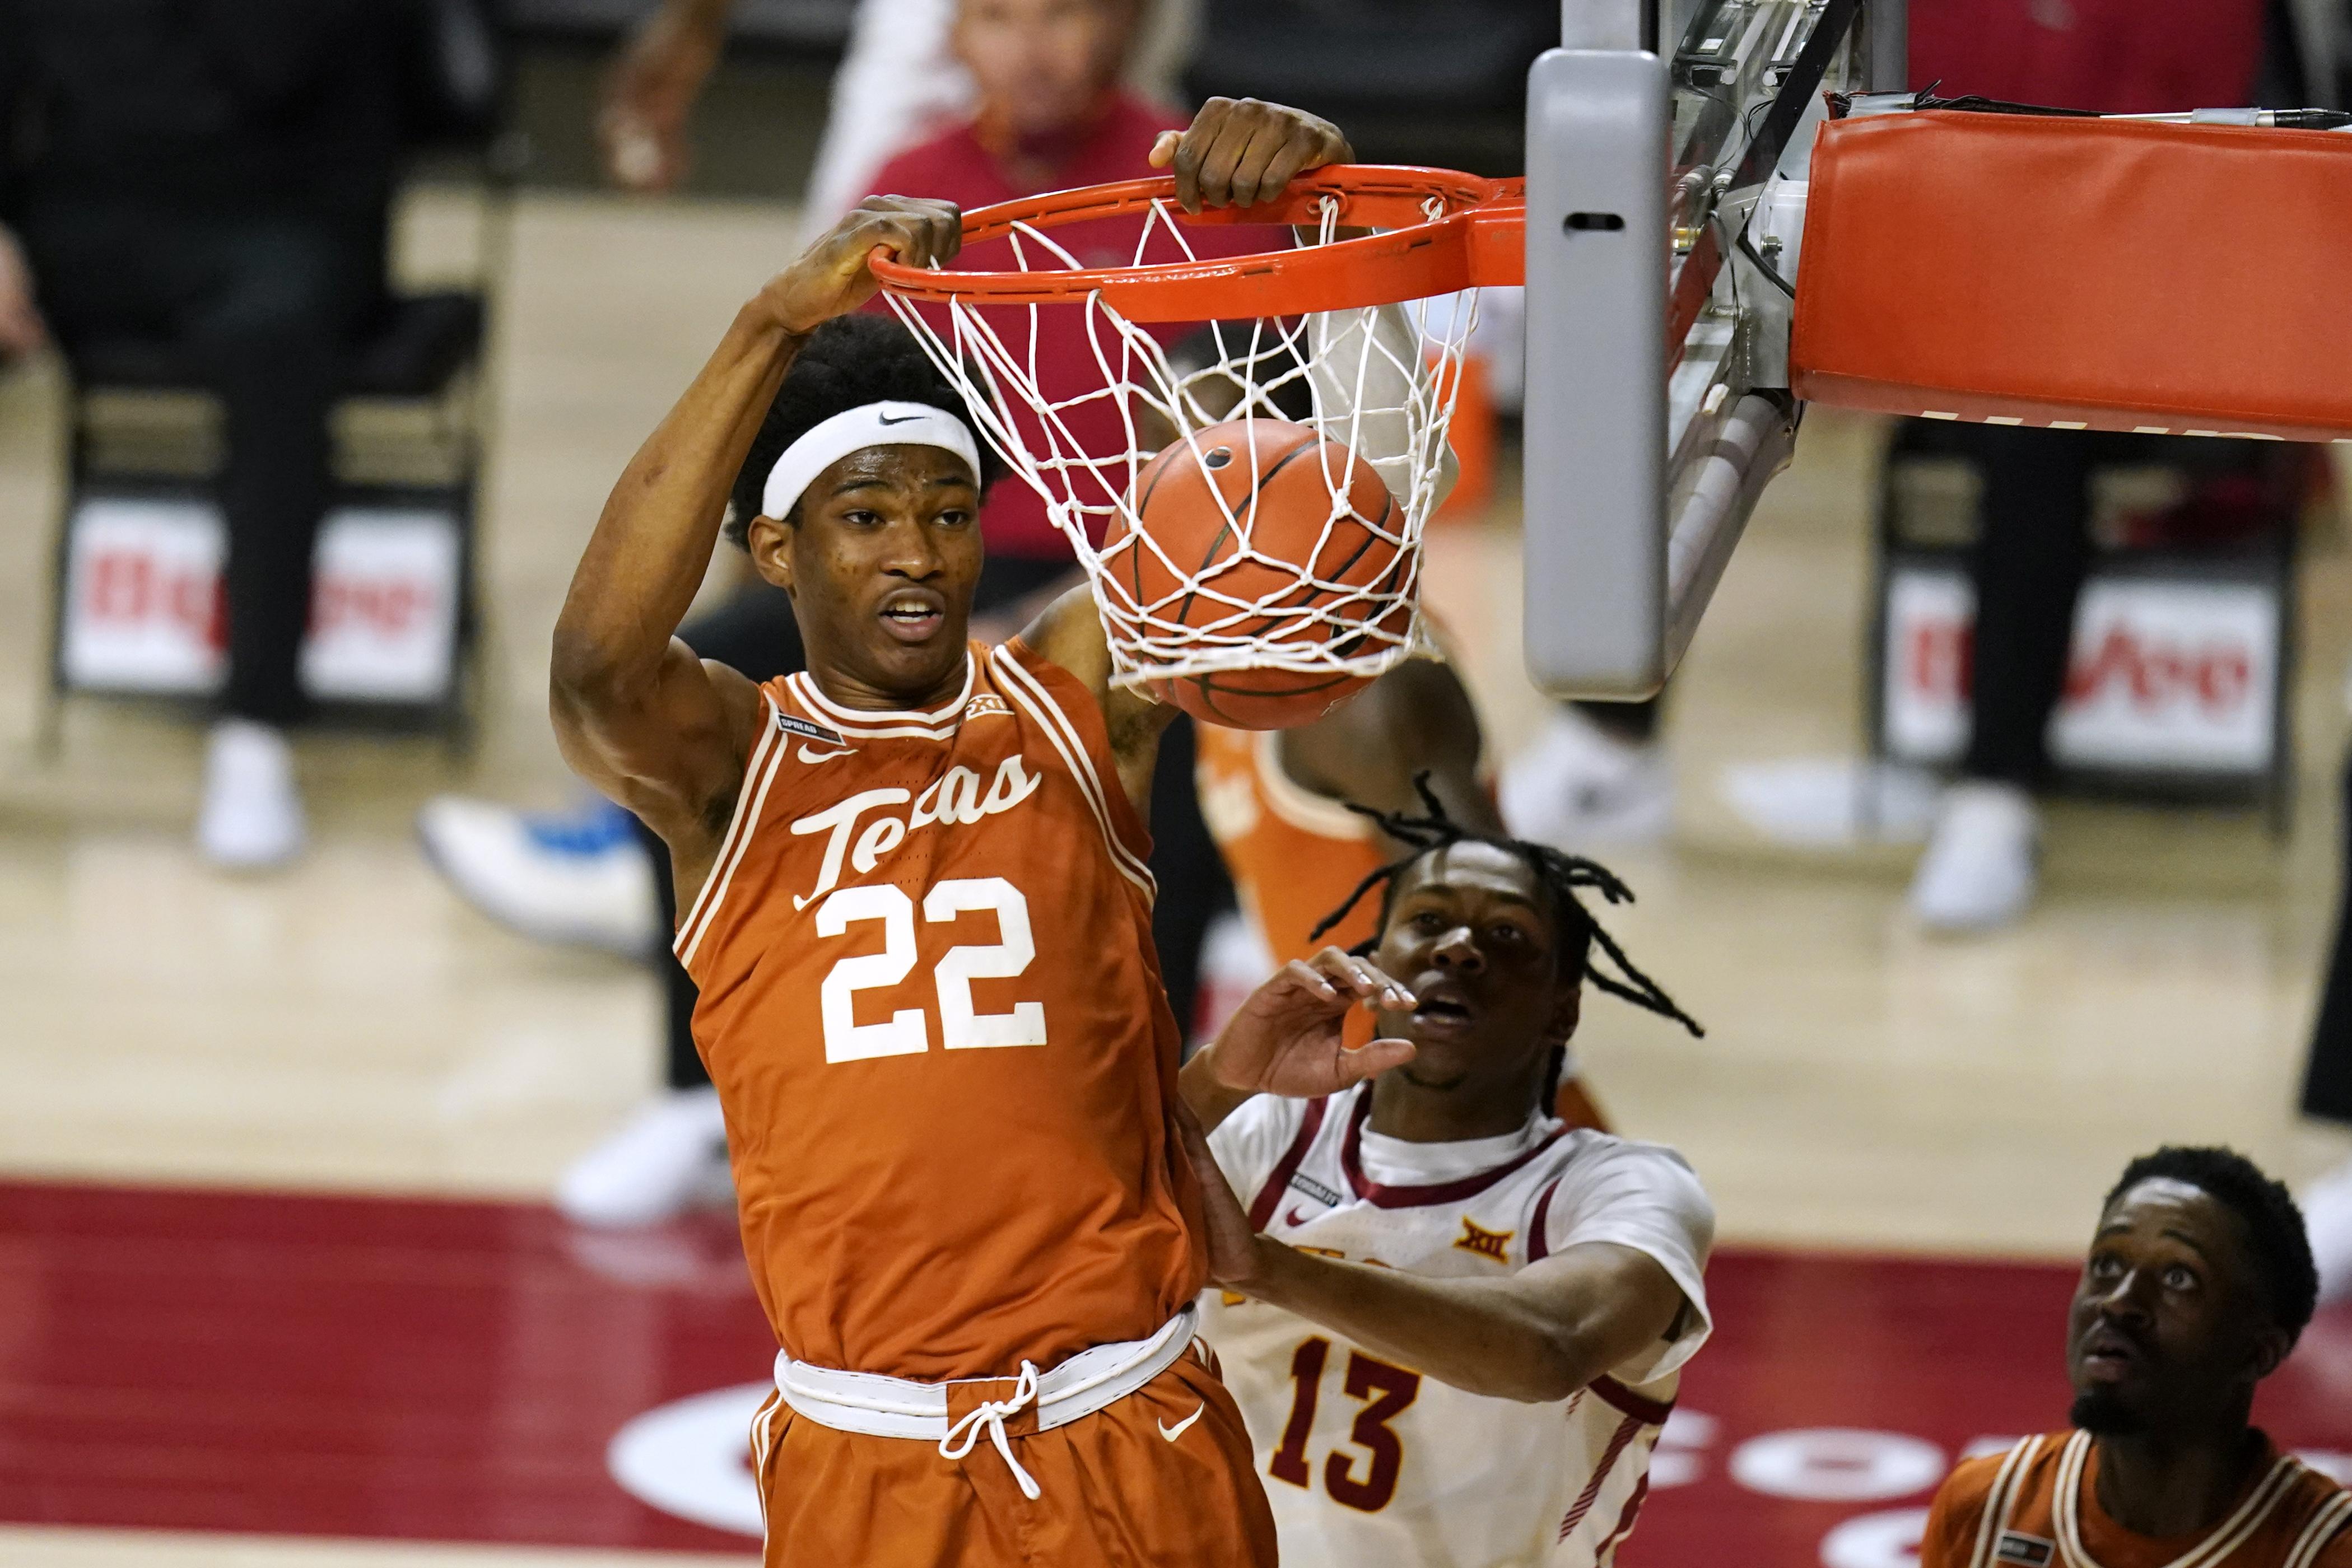 Texas forward Kai Jones (22) dunks the ball ahead of Iowa State forward Javan Johnson (13) during the first half of an NCAA college basketball game, Tuesday, March 2, 2021, in Ames, Iowa.